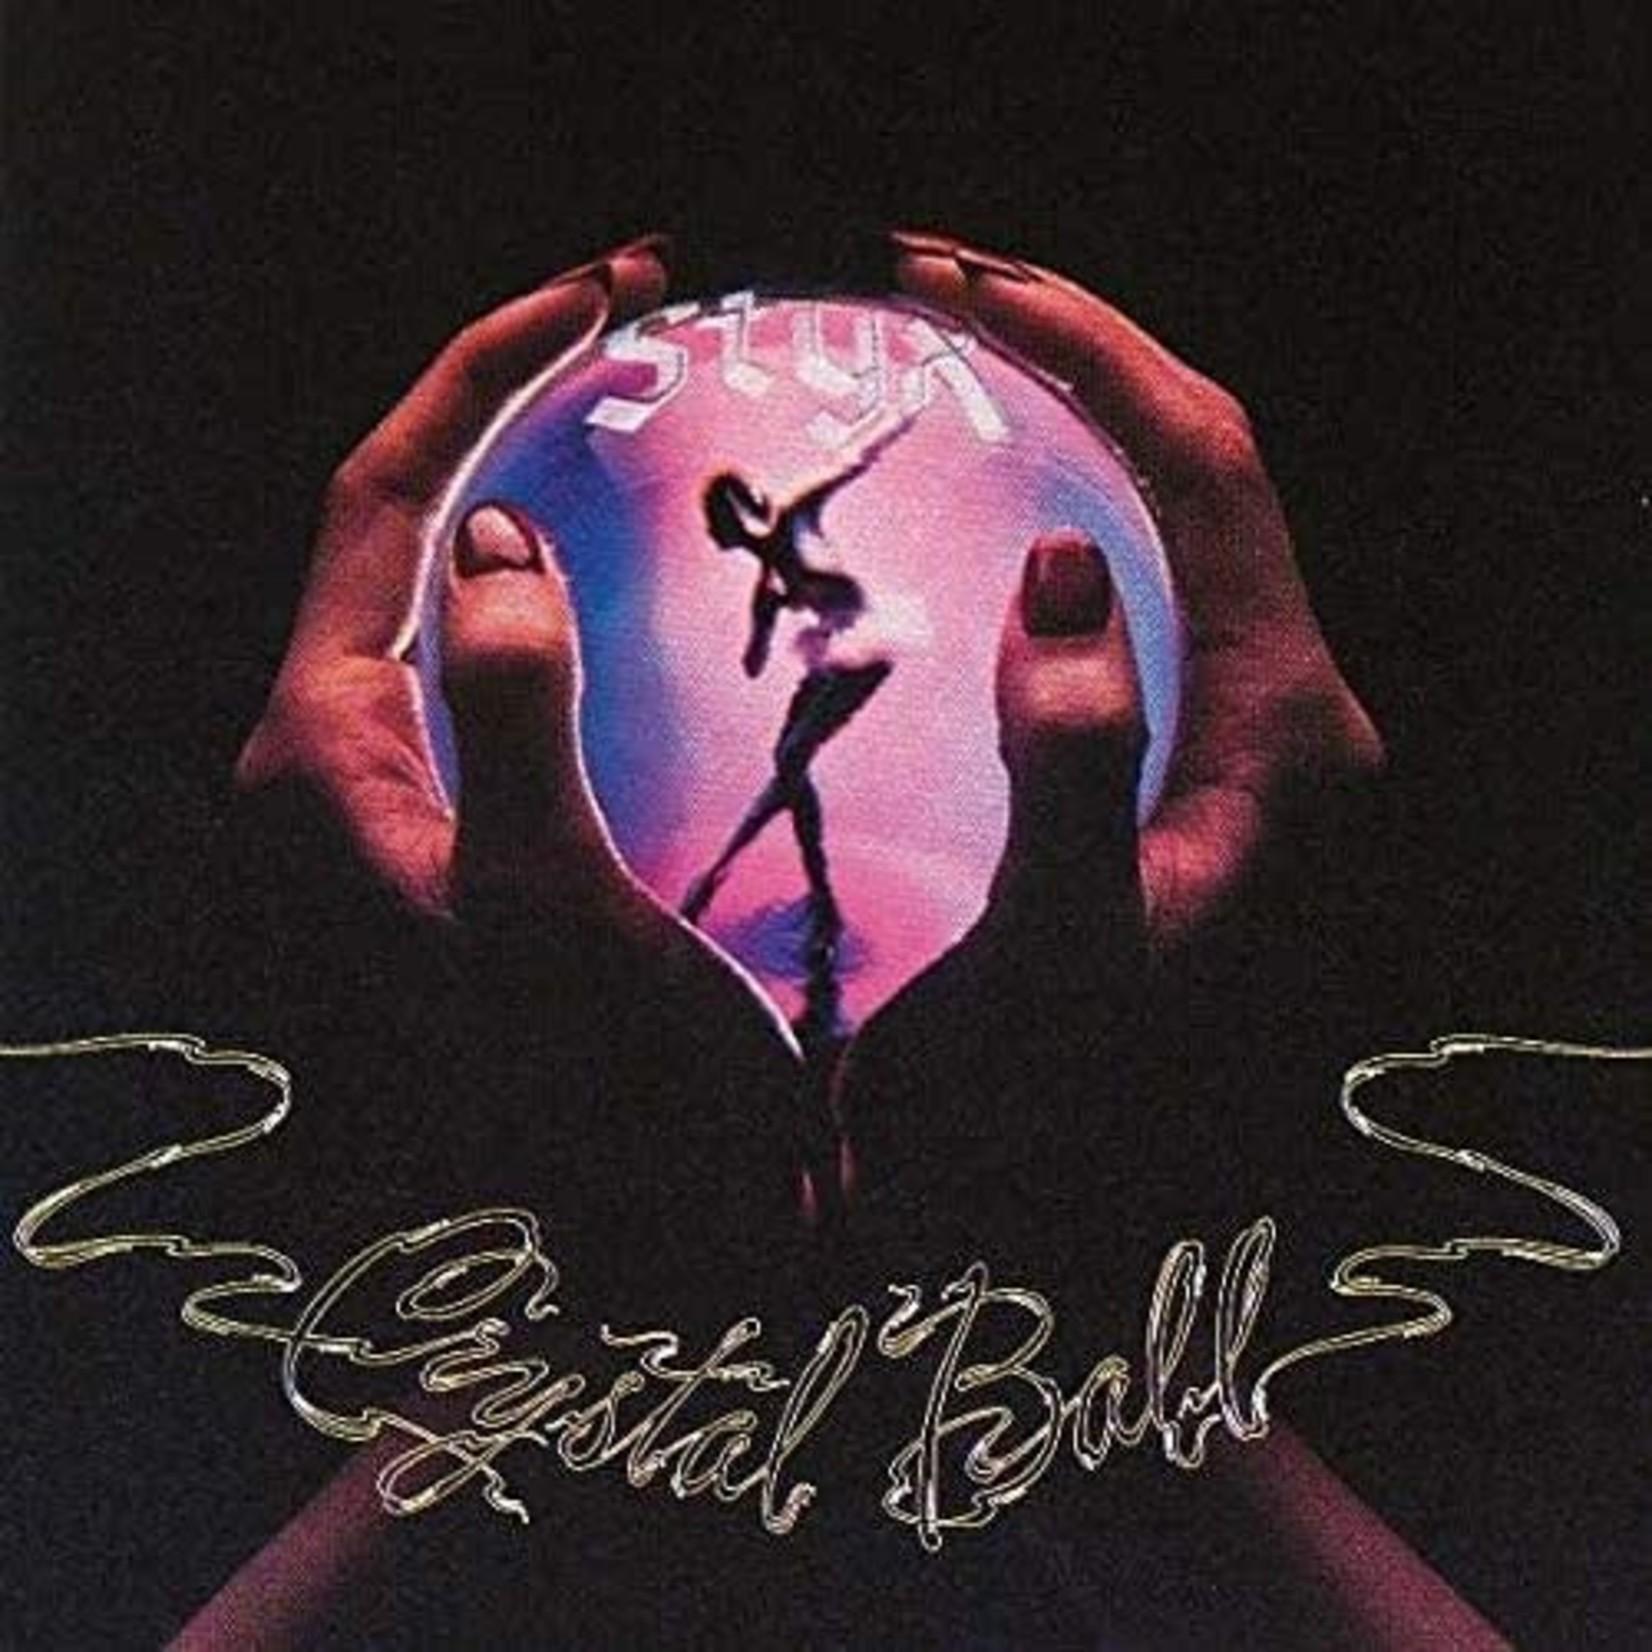 STYX CRYSTAL BALL  LP